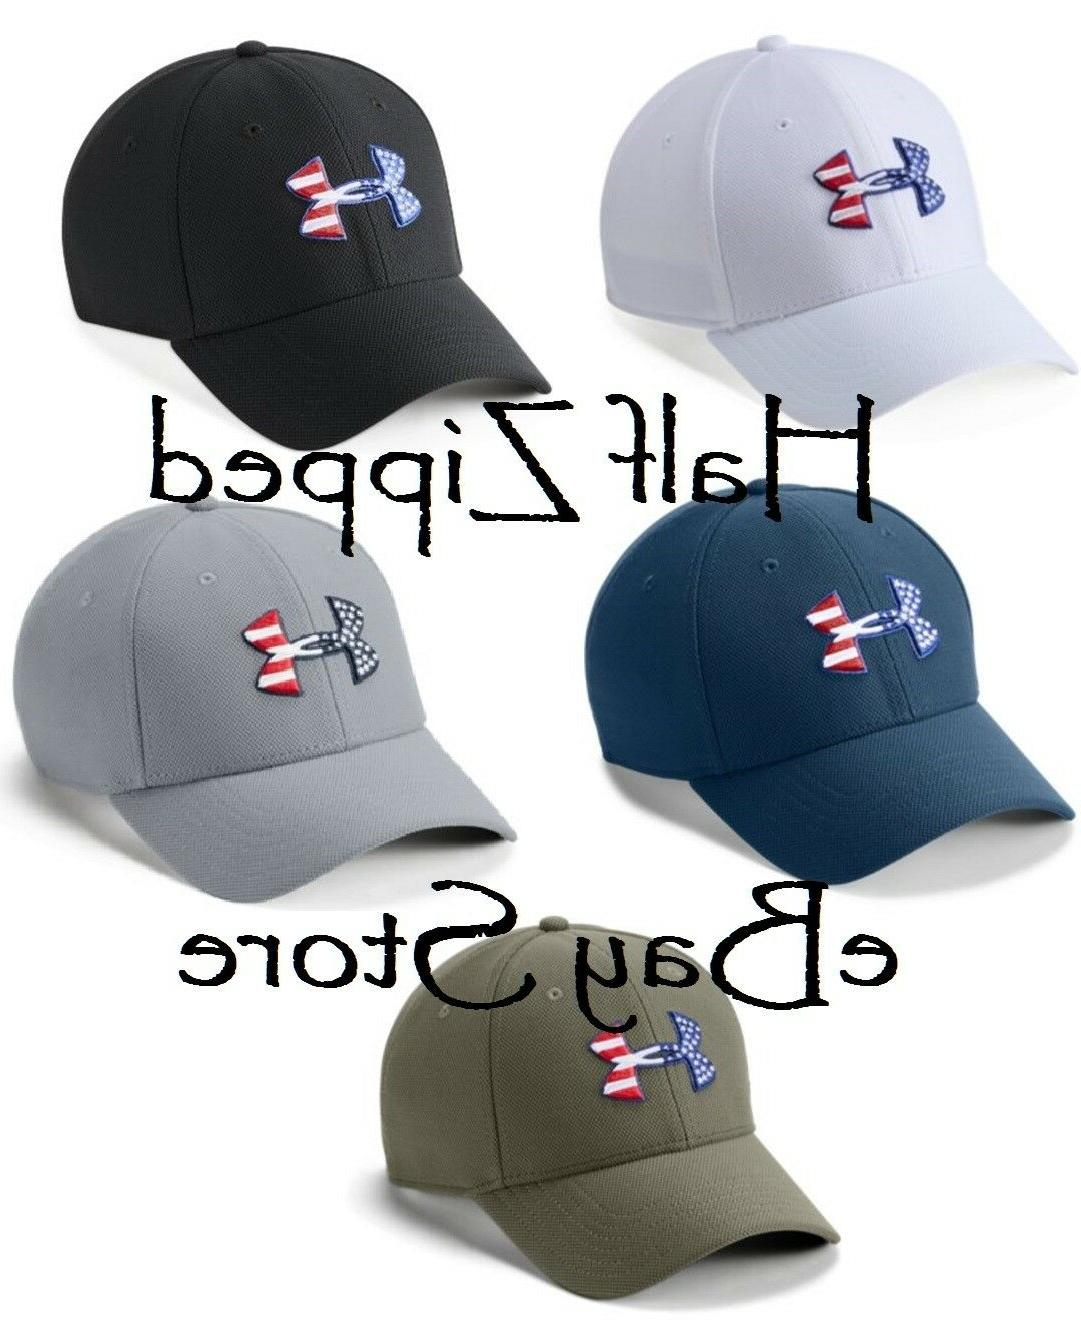 freedom cap 1249835 baseball hat black red